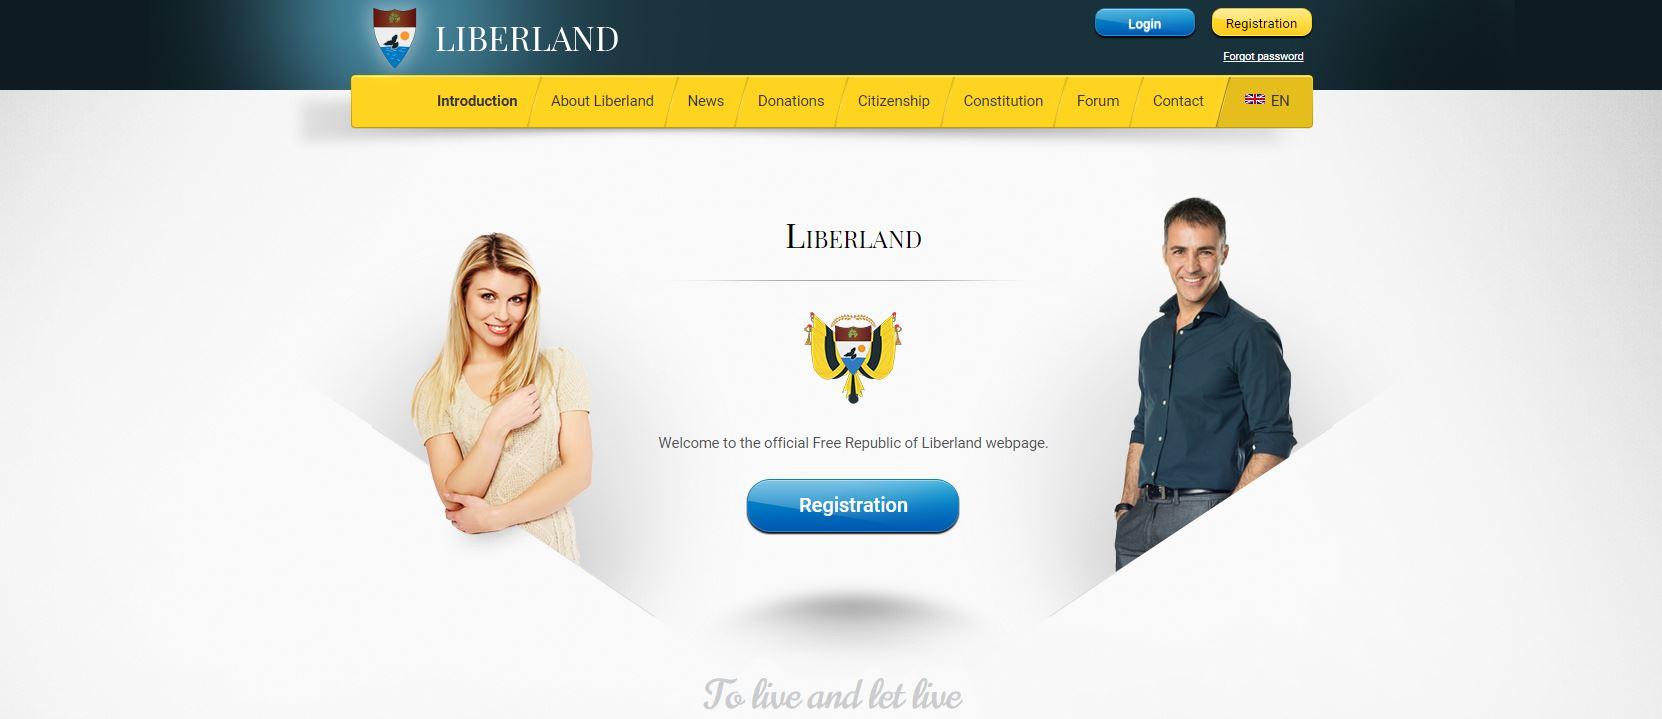 LiberlandSS